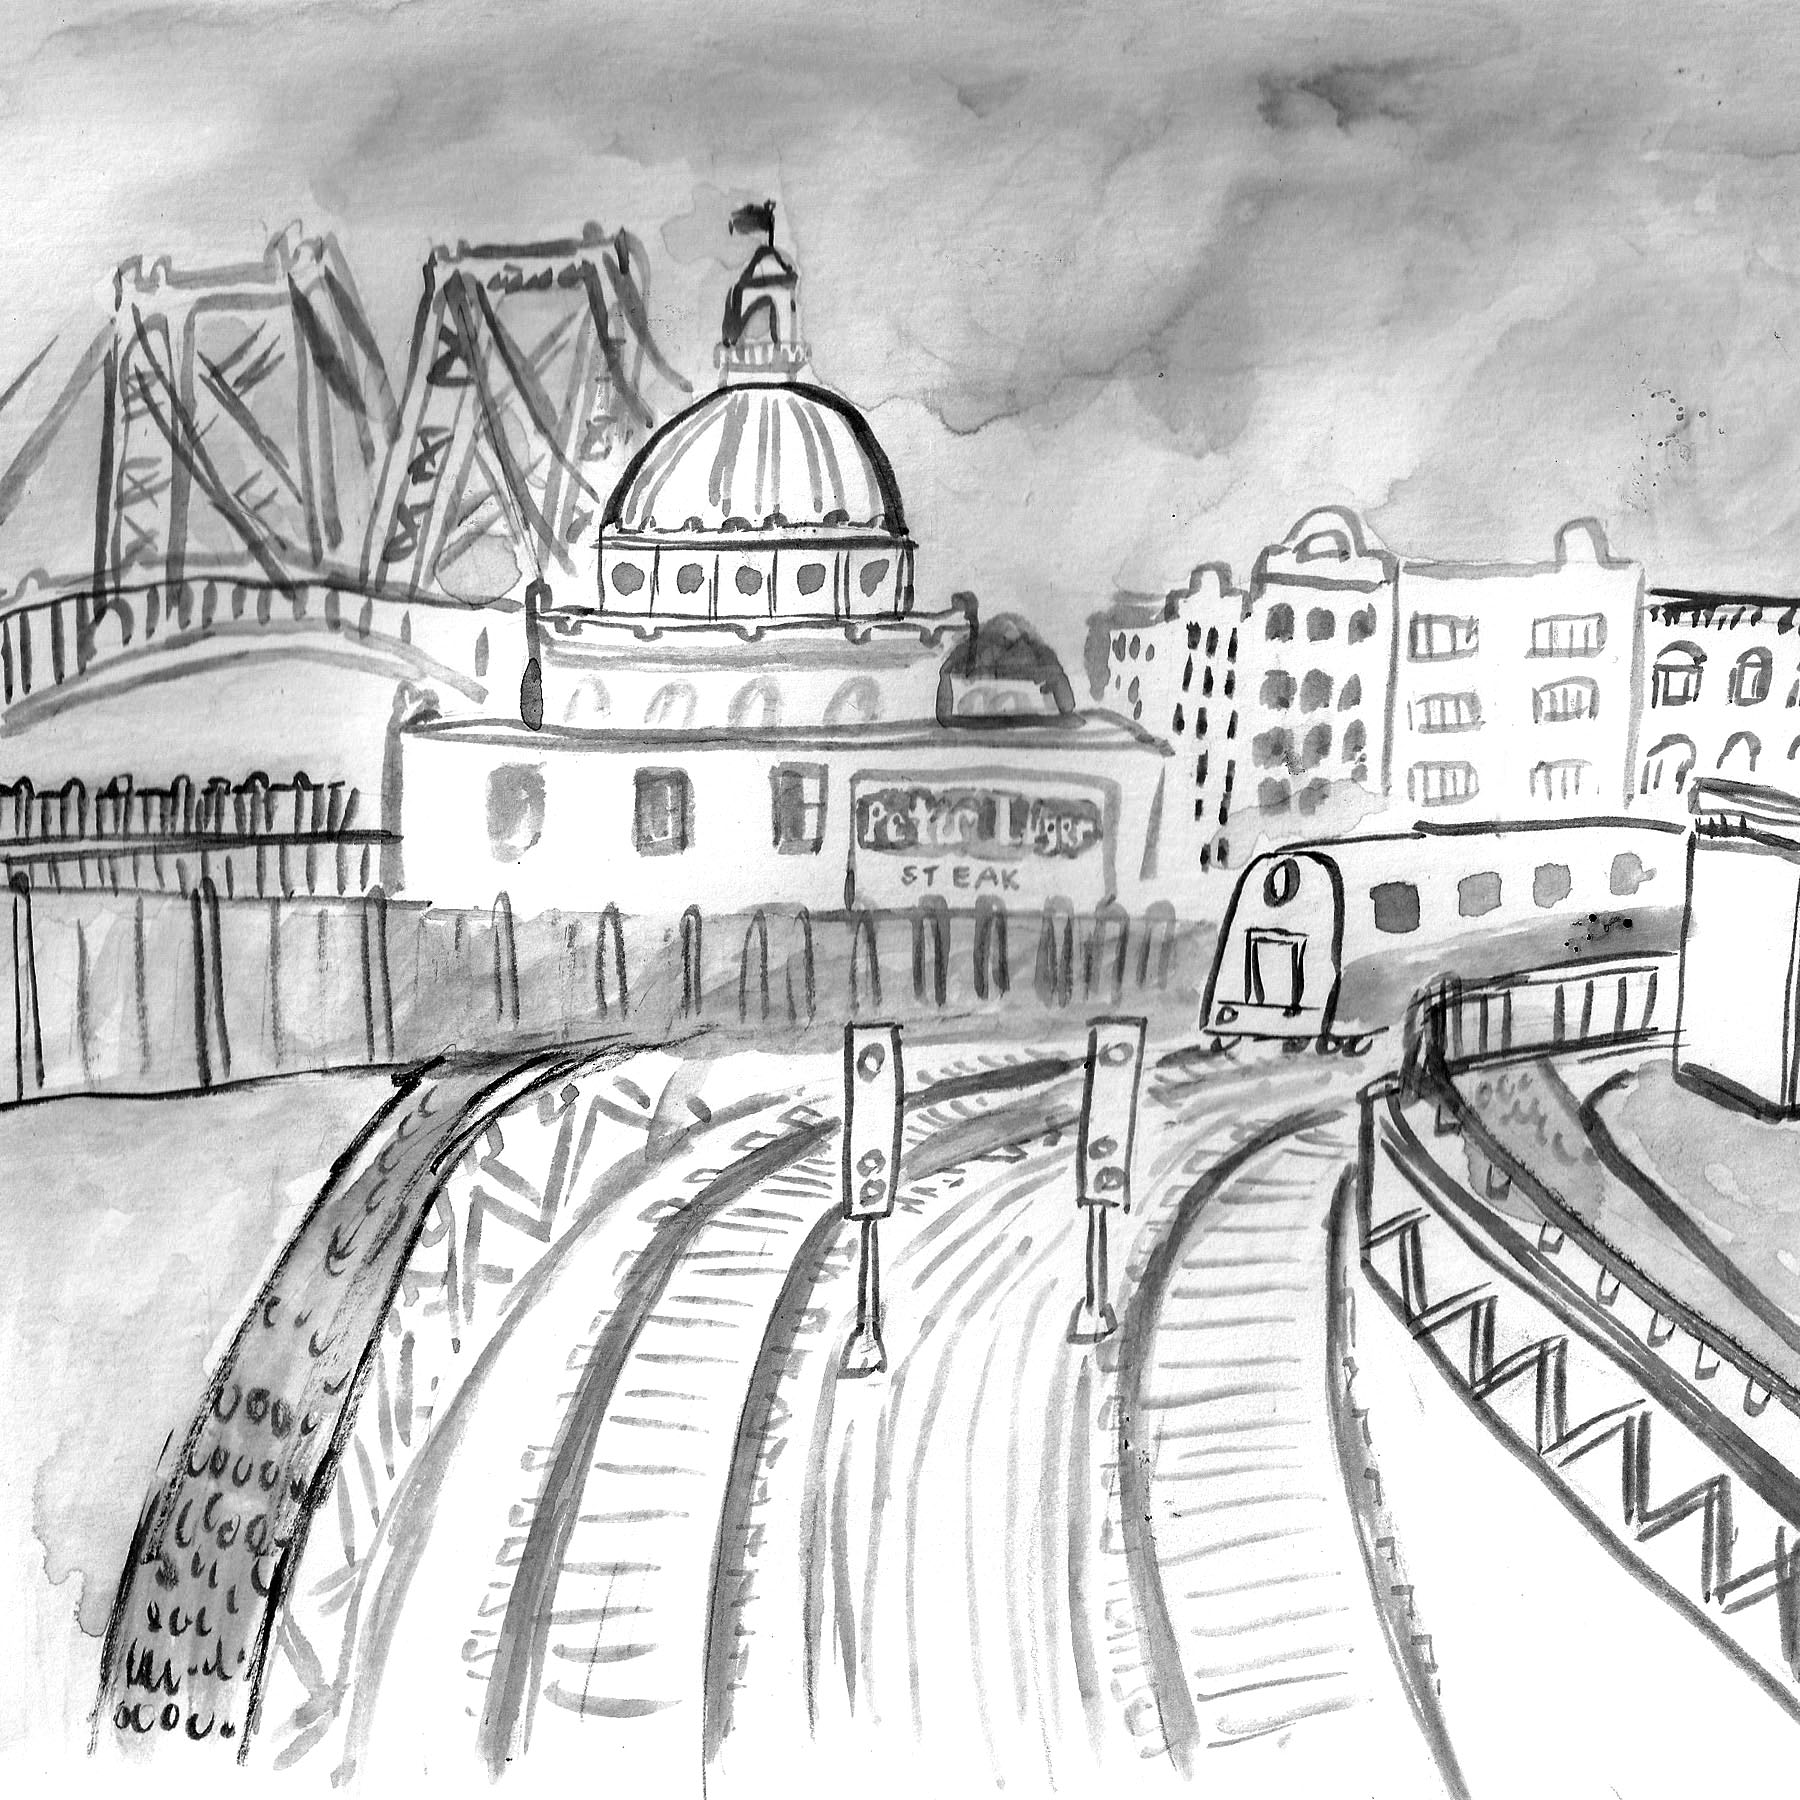 Williamsburg Bridge 8X10 Ink Drawing $400